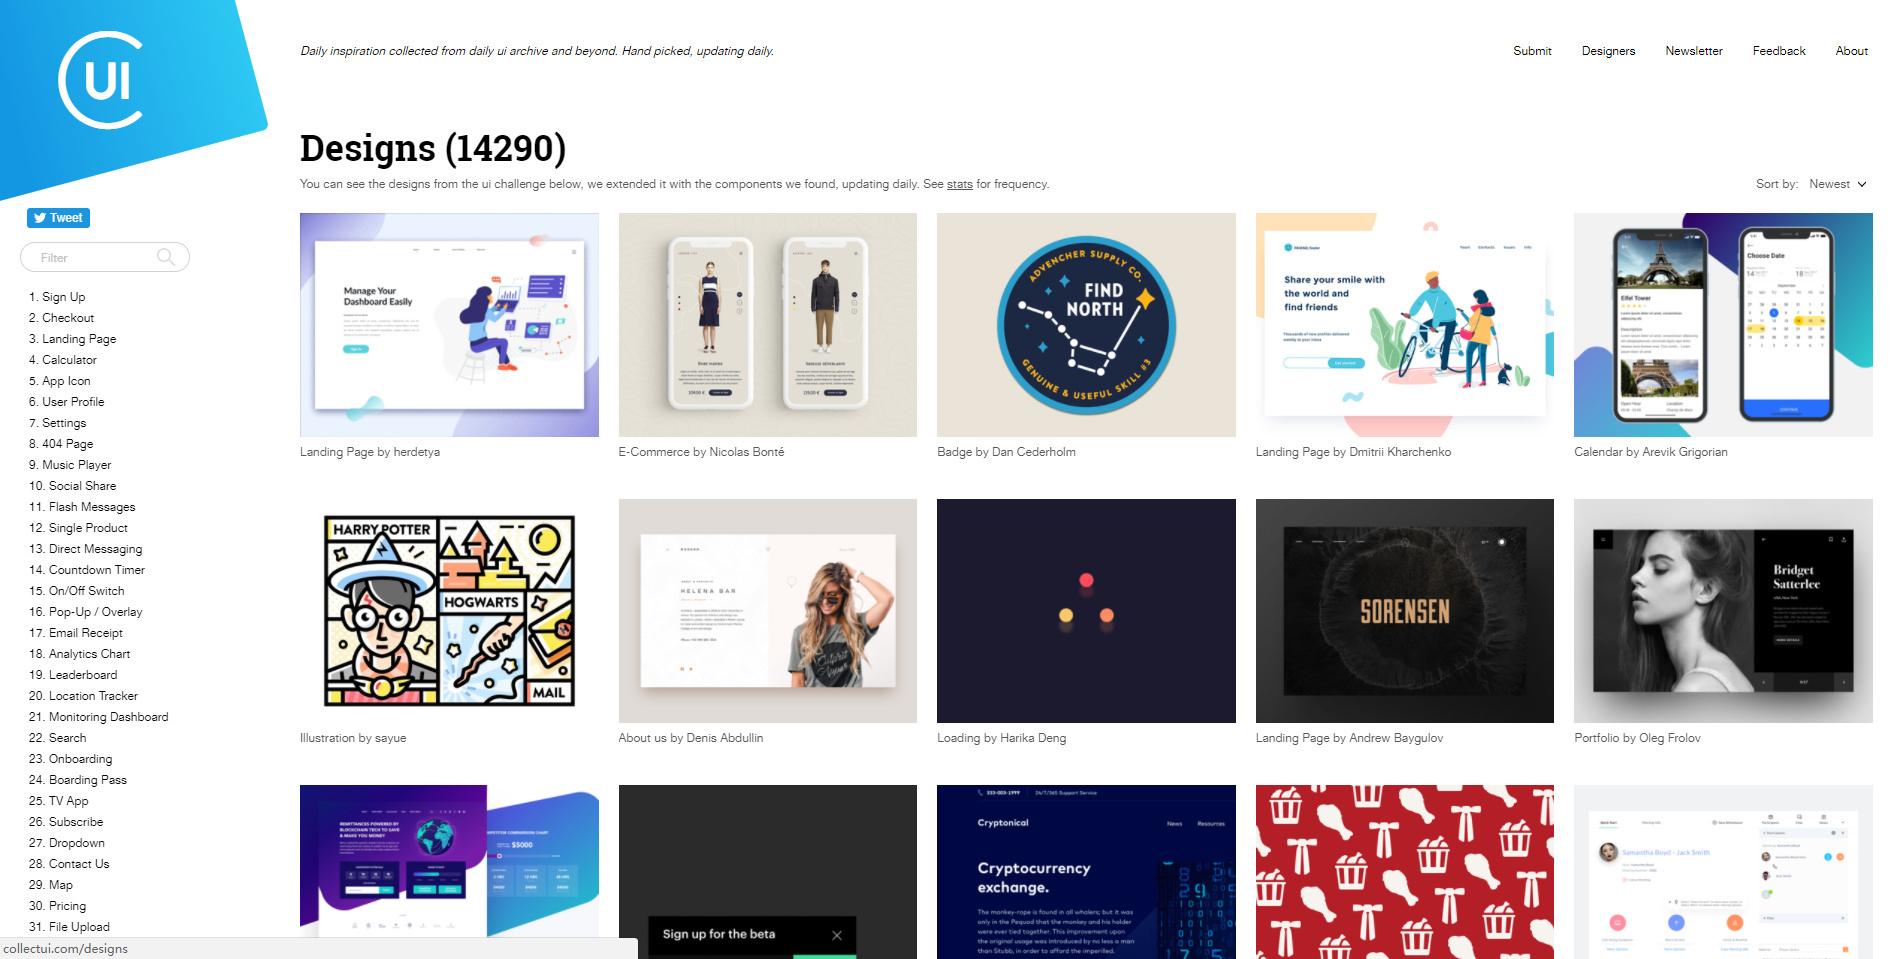 ui 设计师必存的十大网站图片